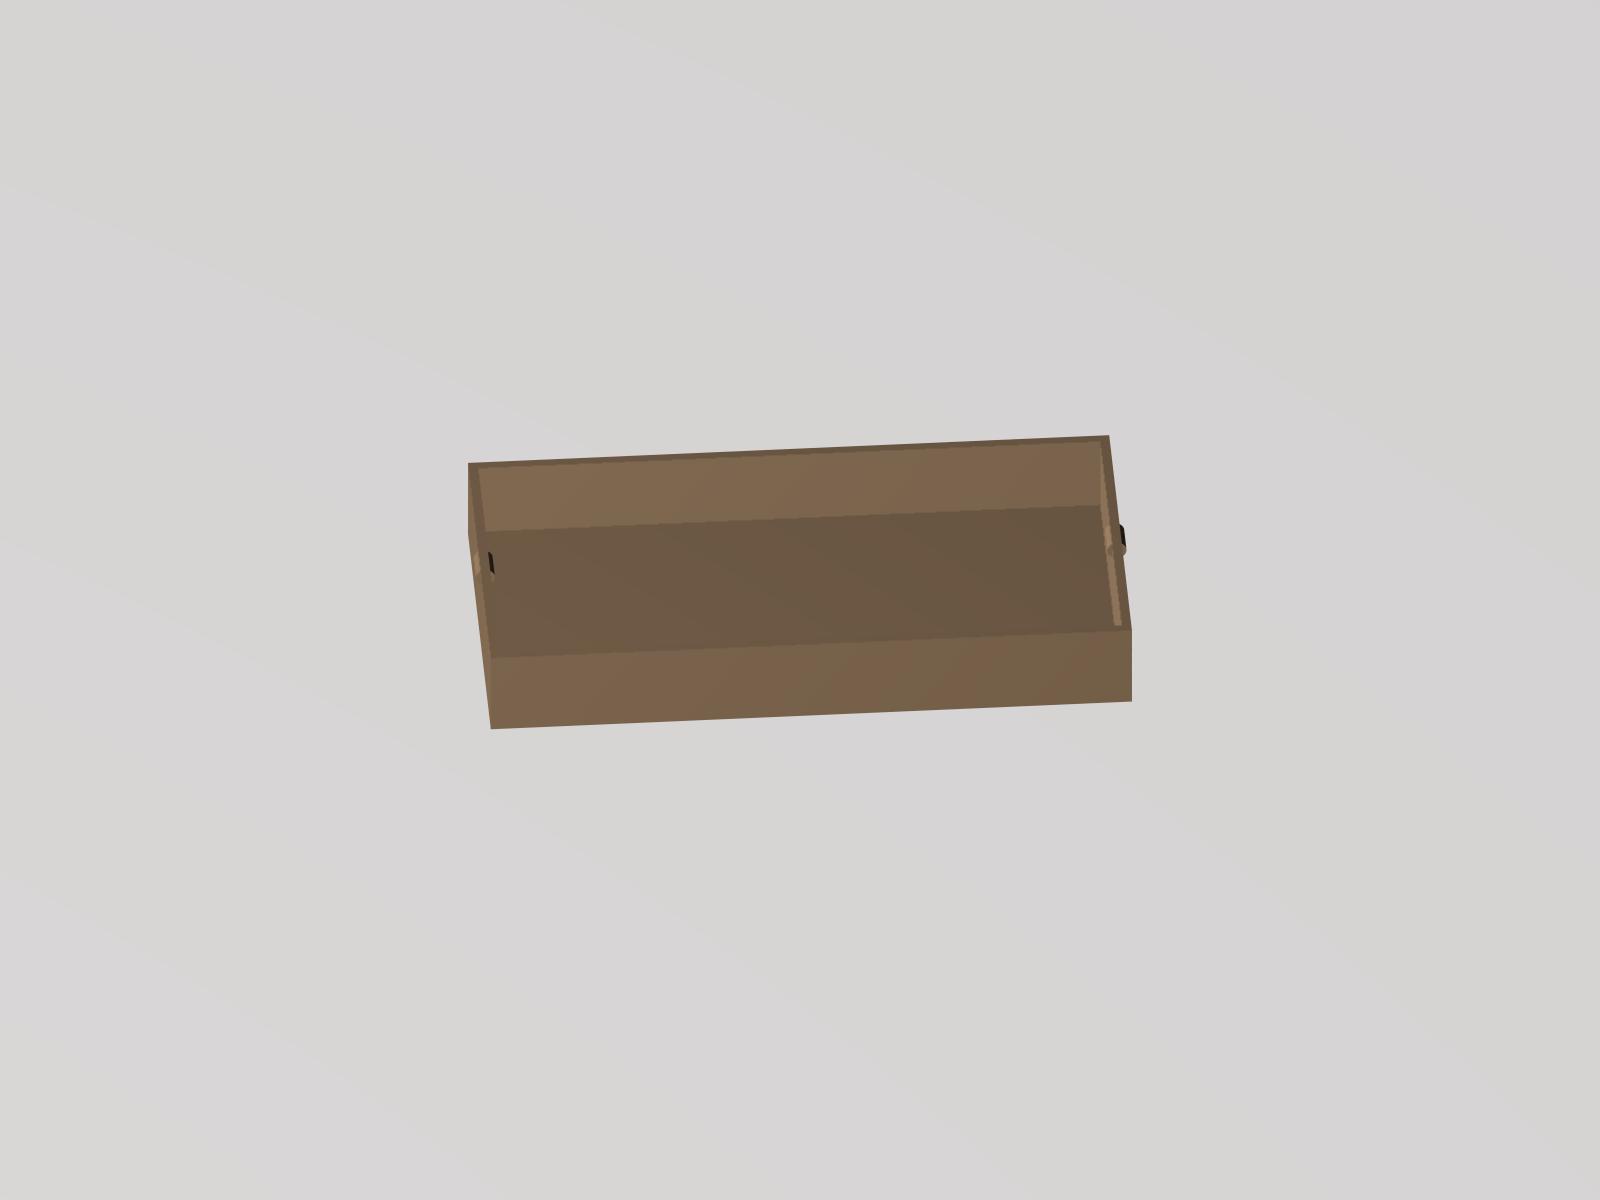 Lulzbot 带槽式快速接头的干燥剂箱